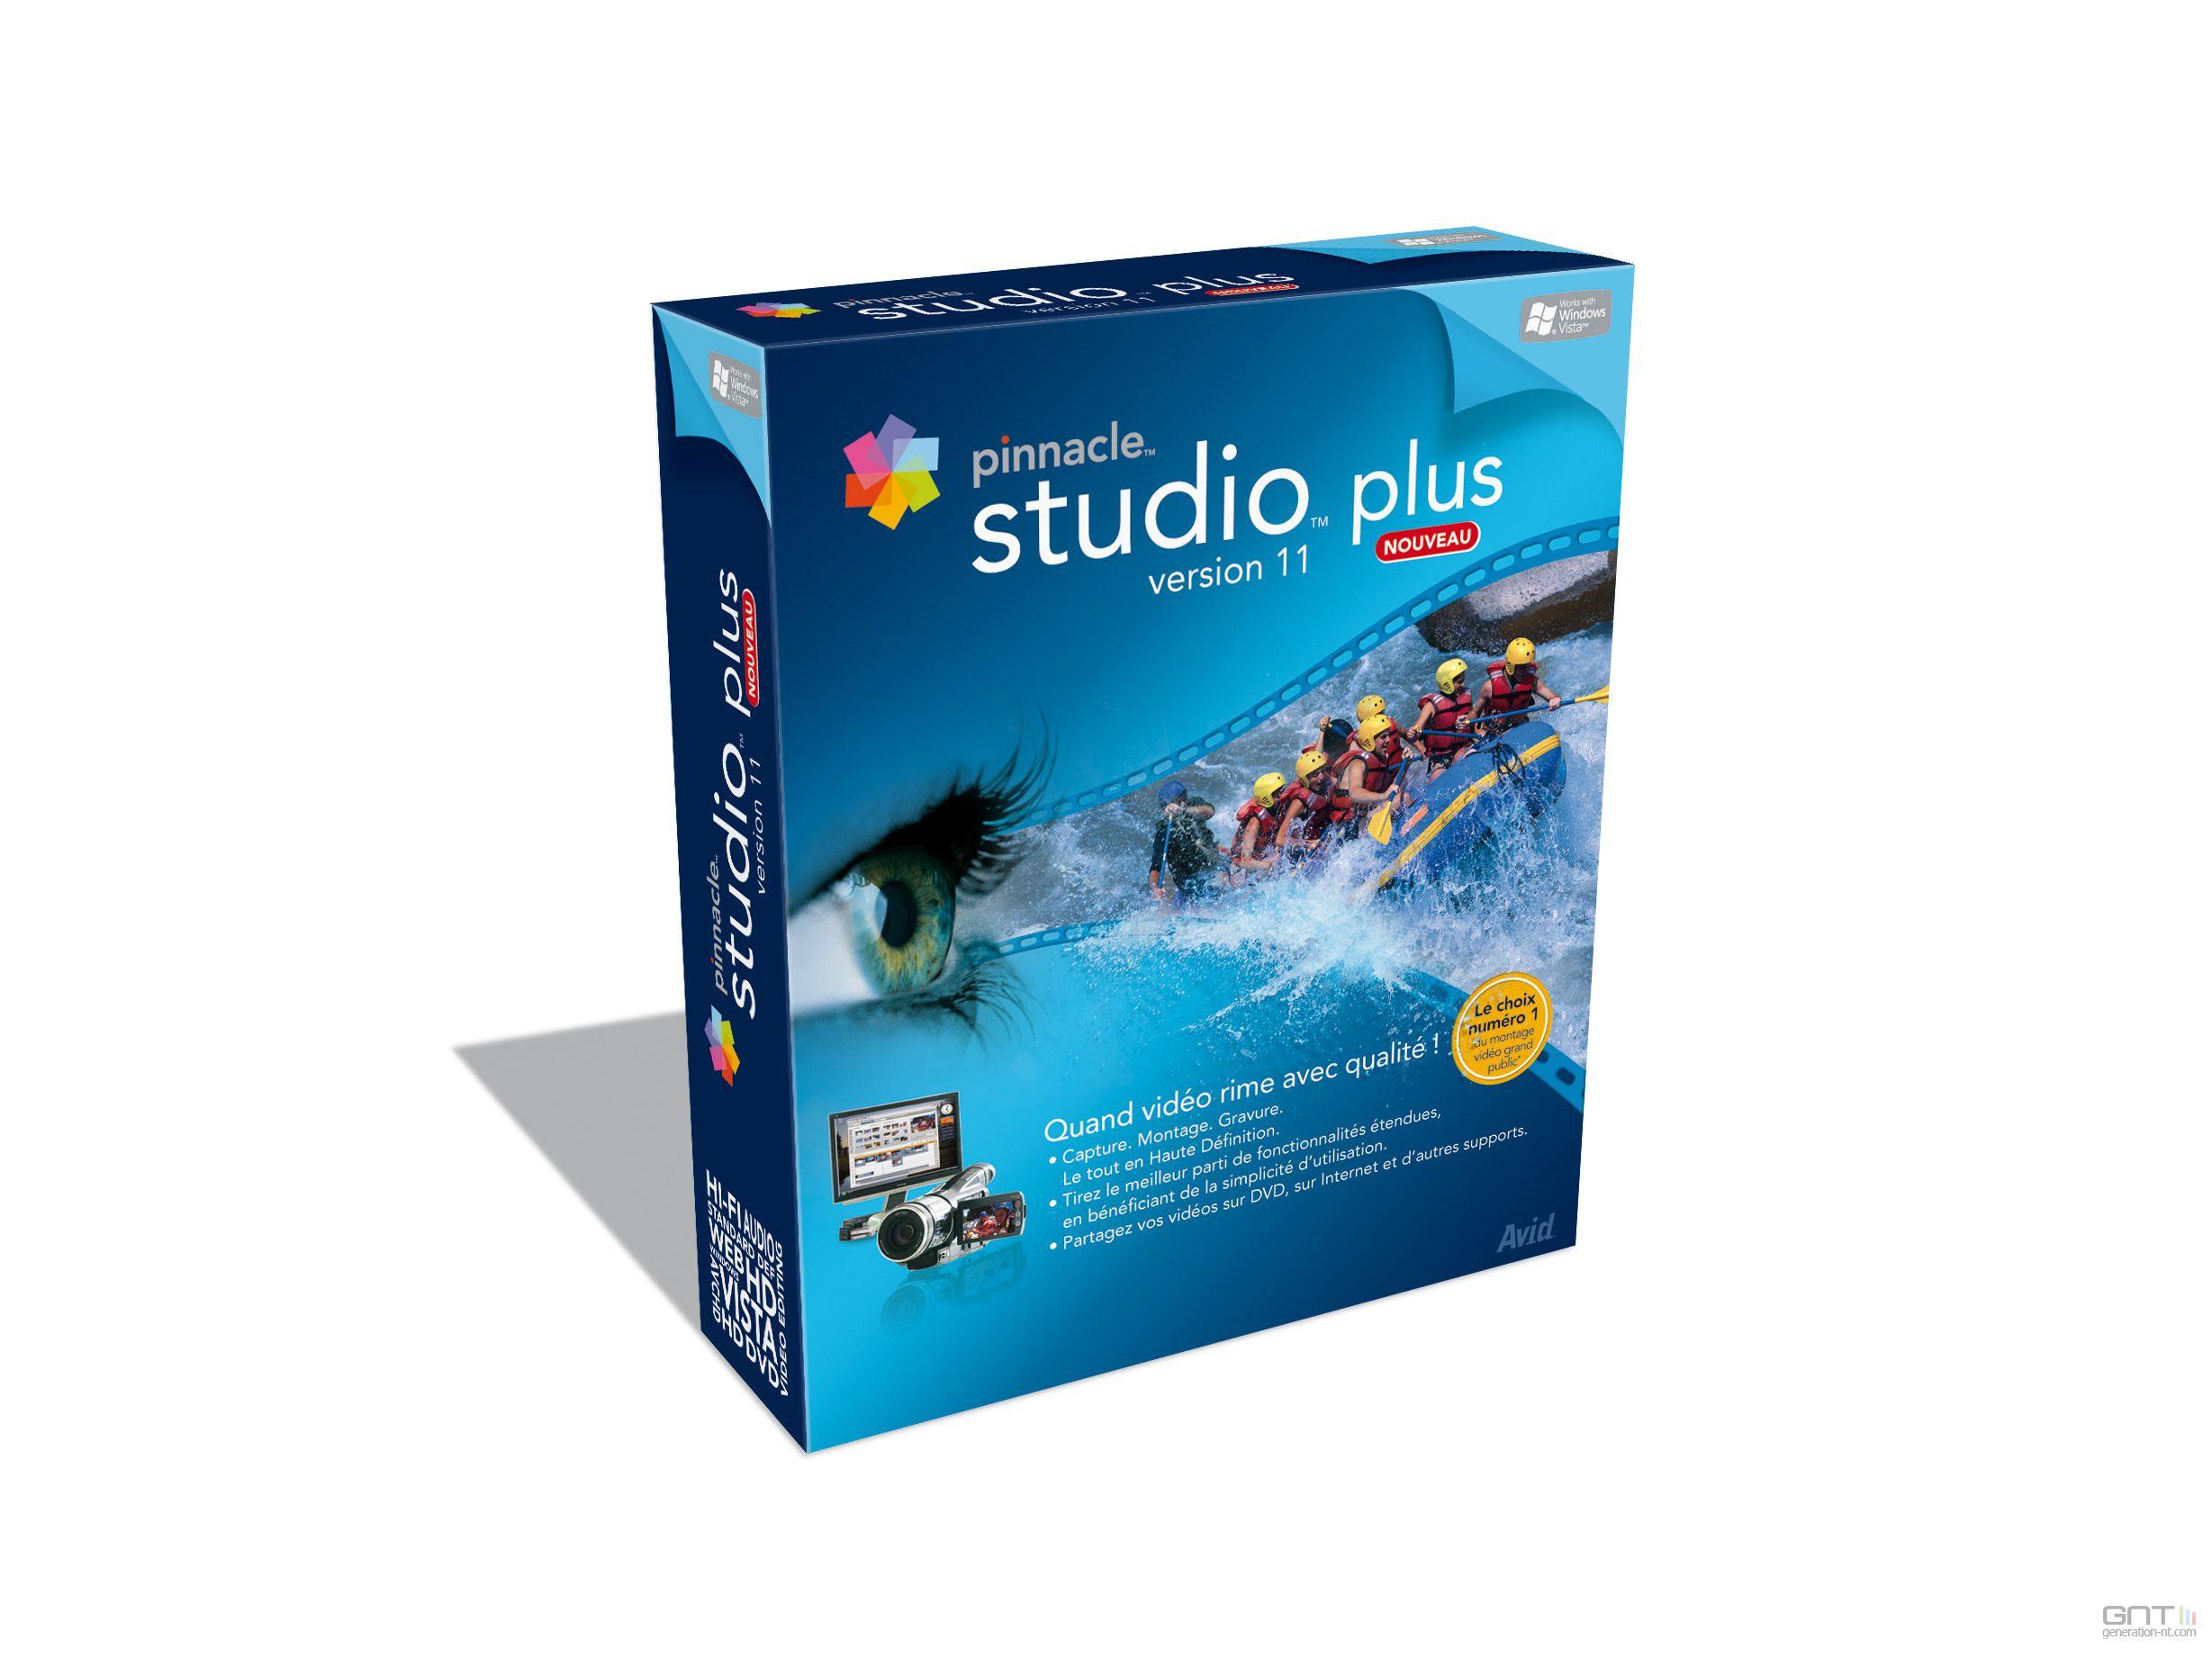 Avid innacle Systems STUDIO Plus V.11 RUS.